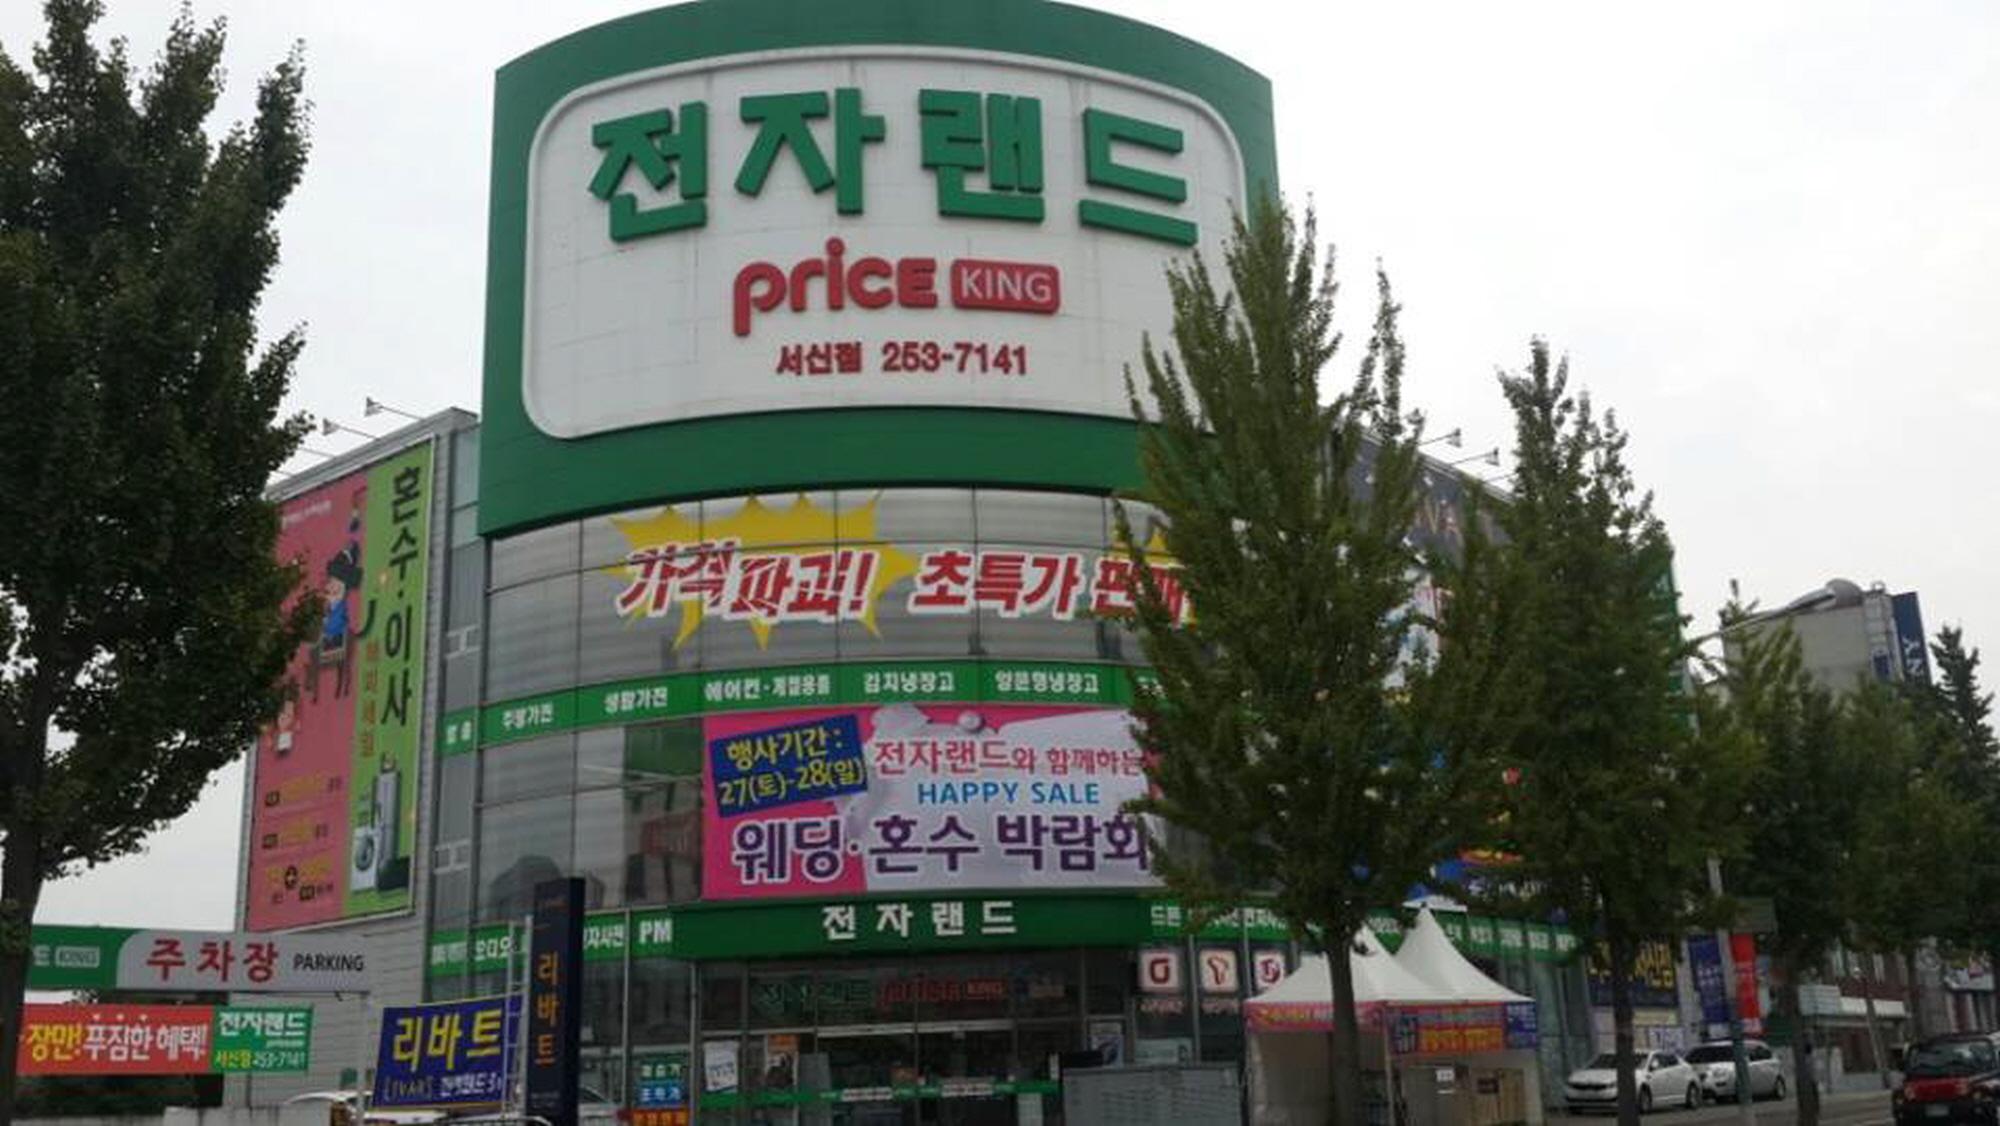 ET Land Price King – Seosin Branch (전자랜드 프라이스킹 (서신점))